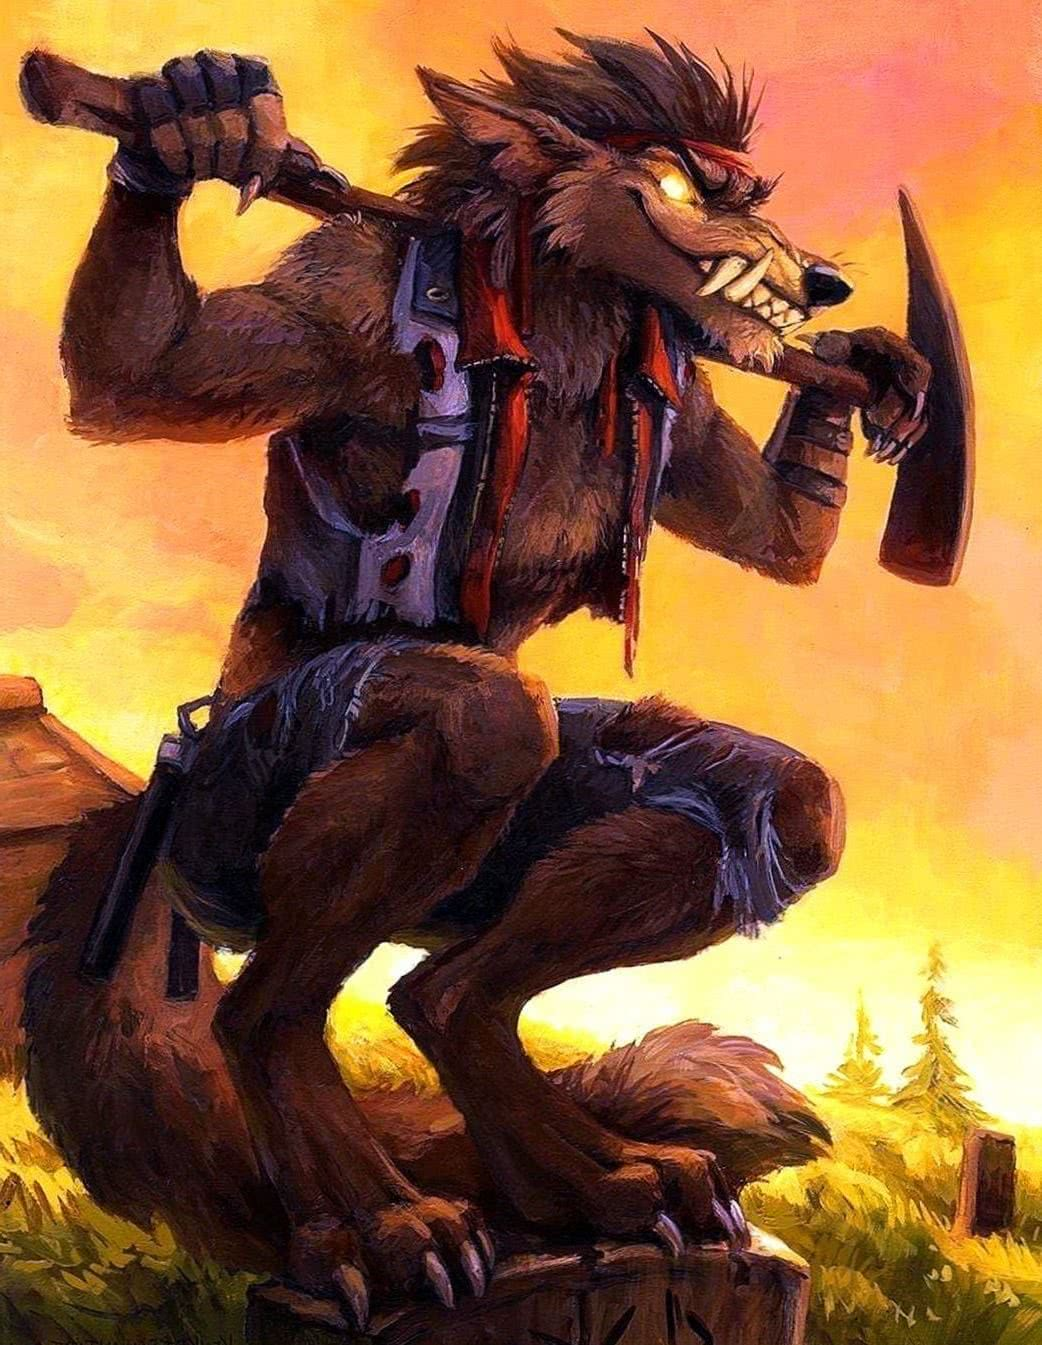 Fortnite Wallpaper Dire Wolf